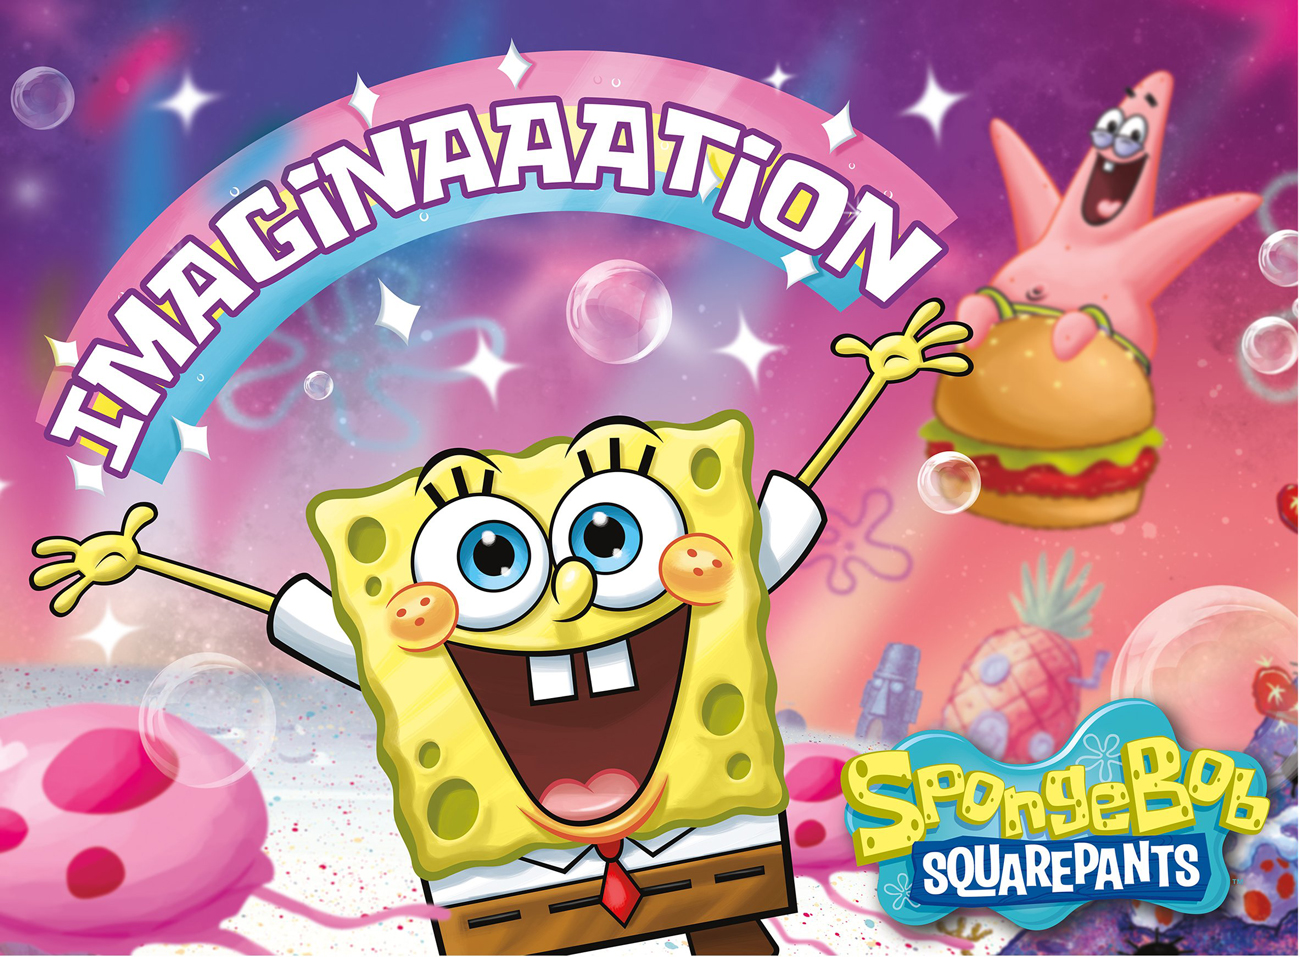 SpongeBob Square Pants Imagination Cartoons Jigsaw Puzzle